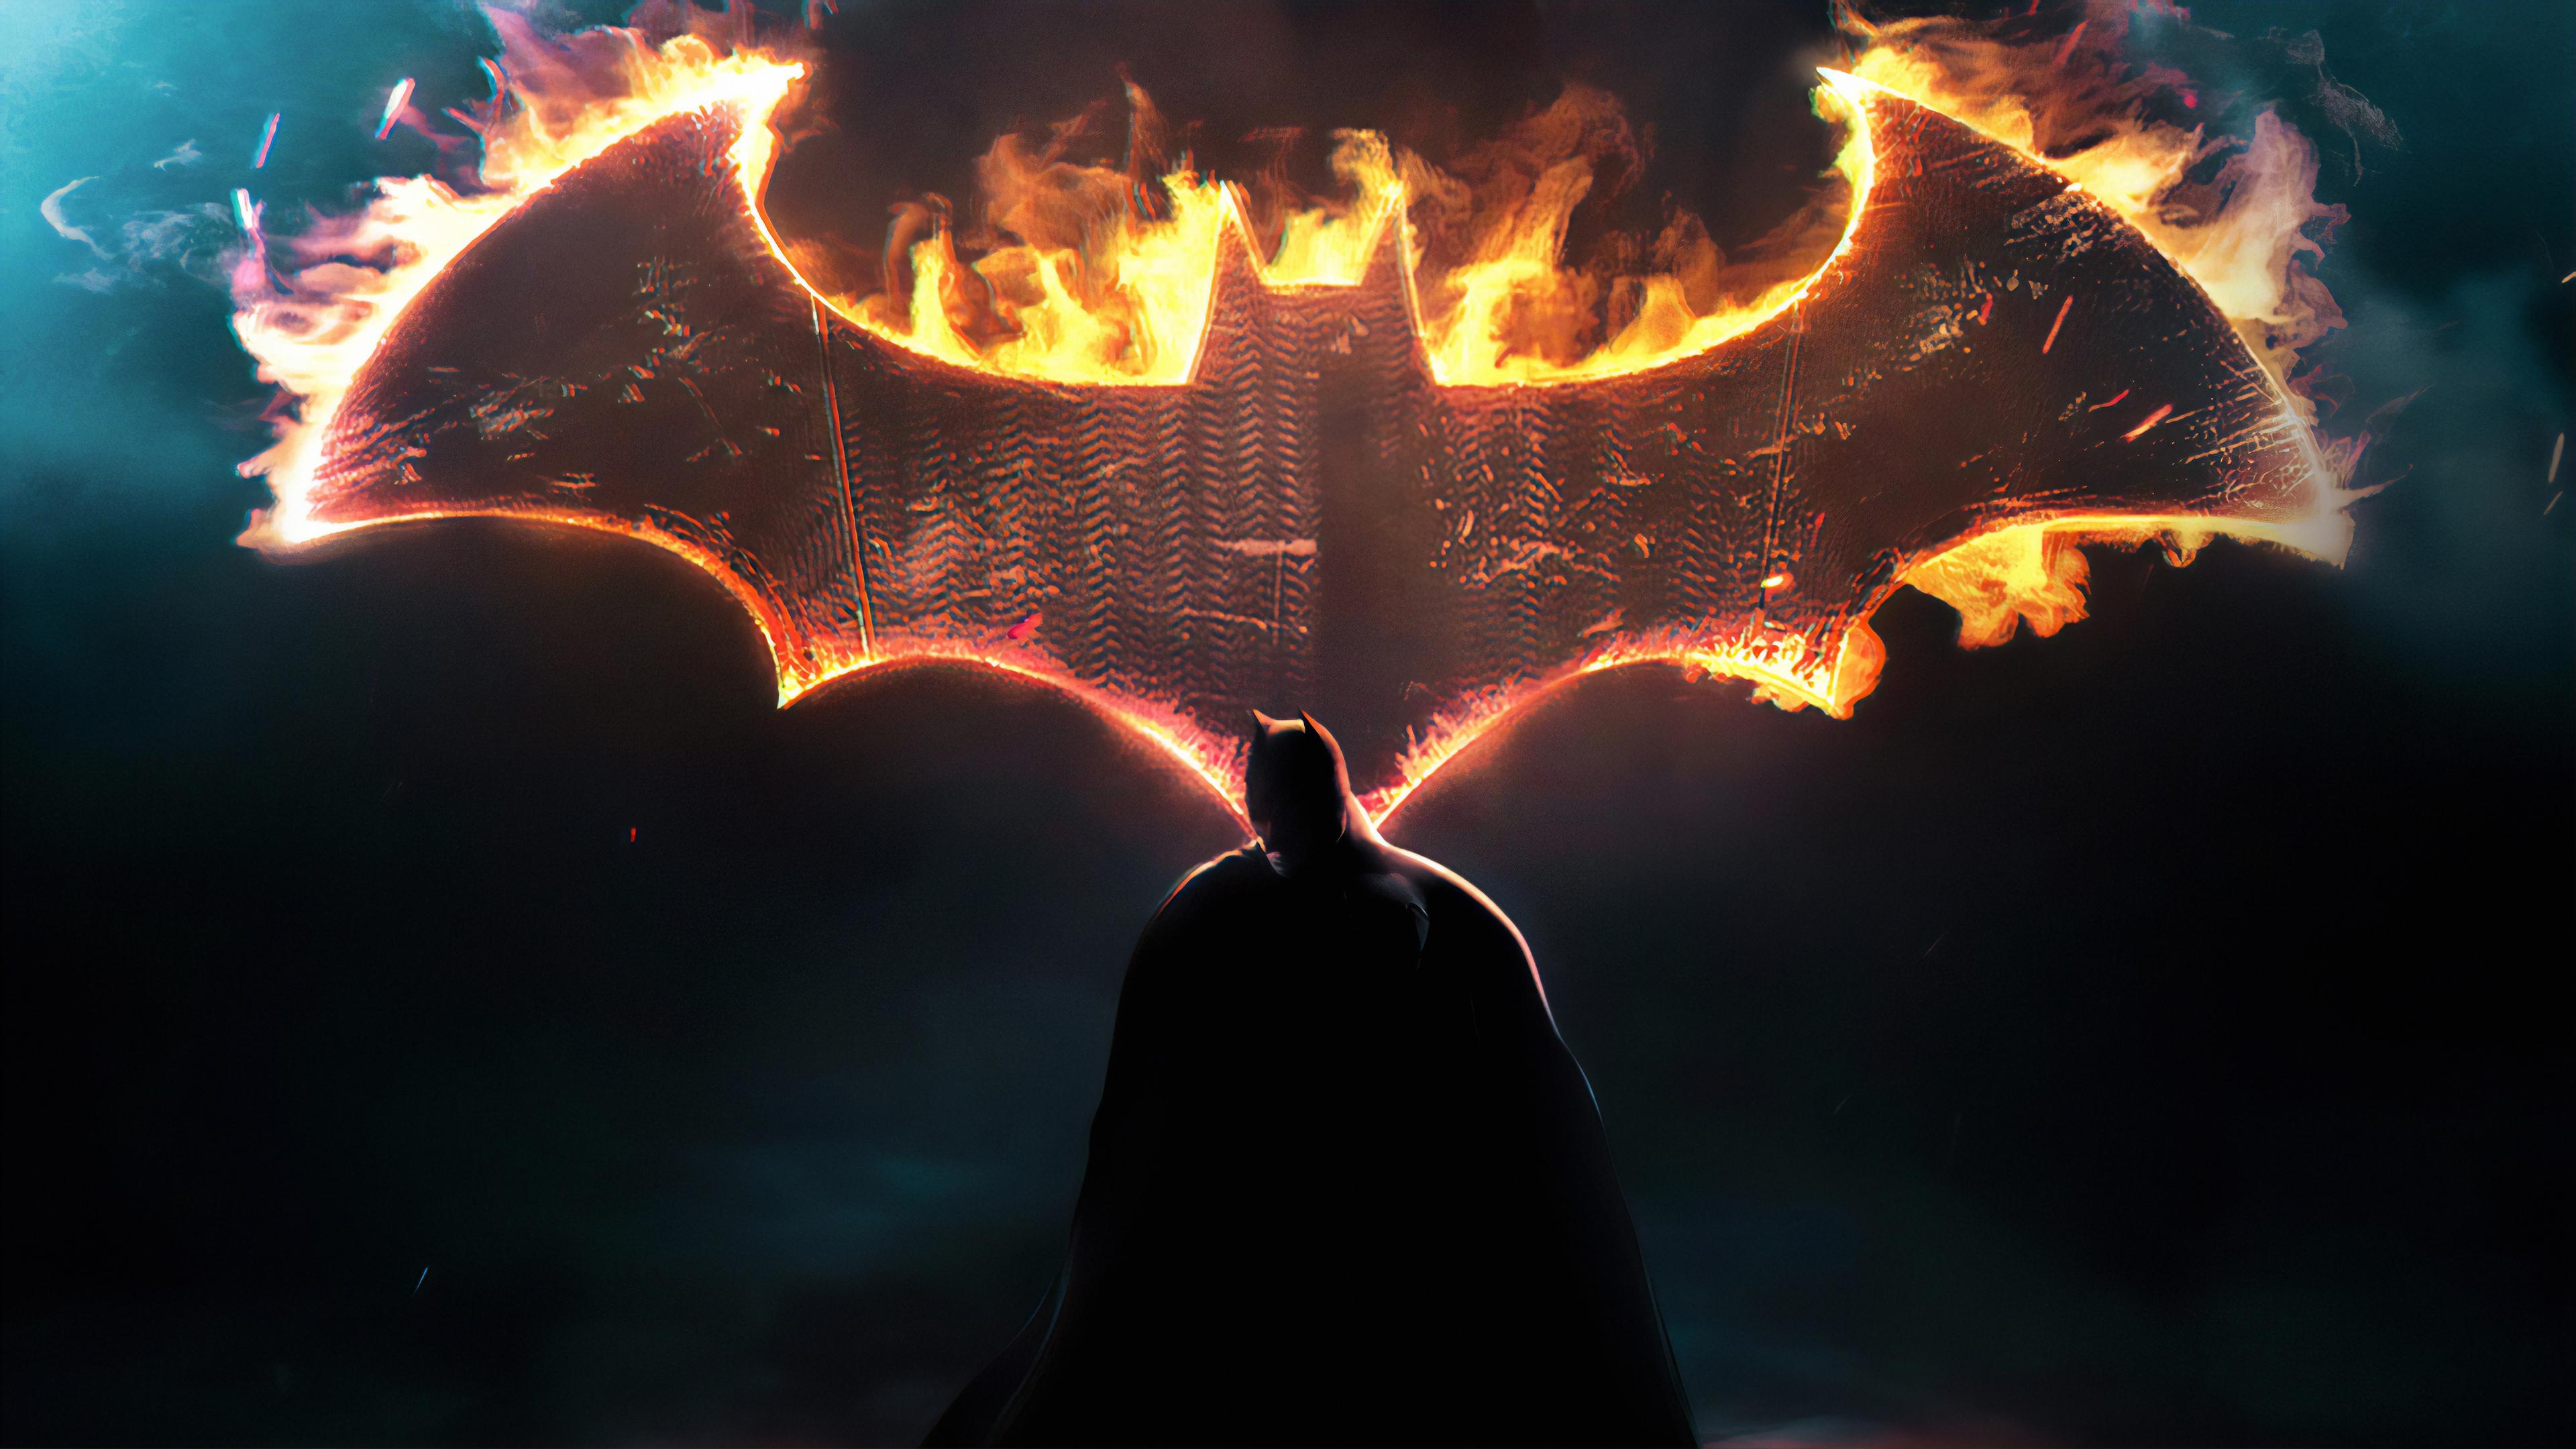 Batman Dark Knight Fire Logo - Batman Wallpaper For Pc - HD Wallpaper